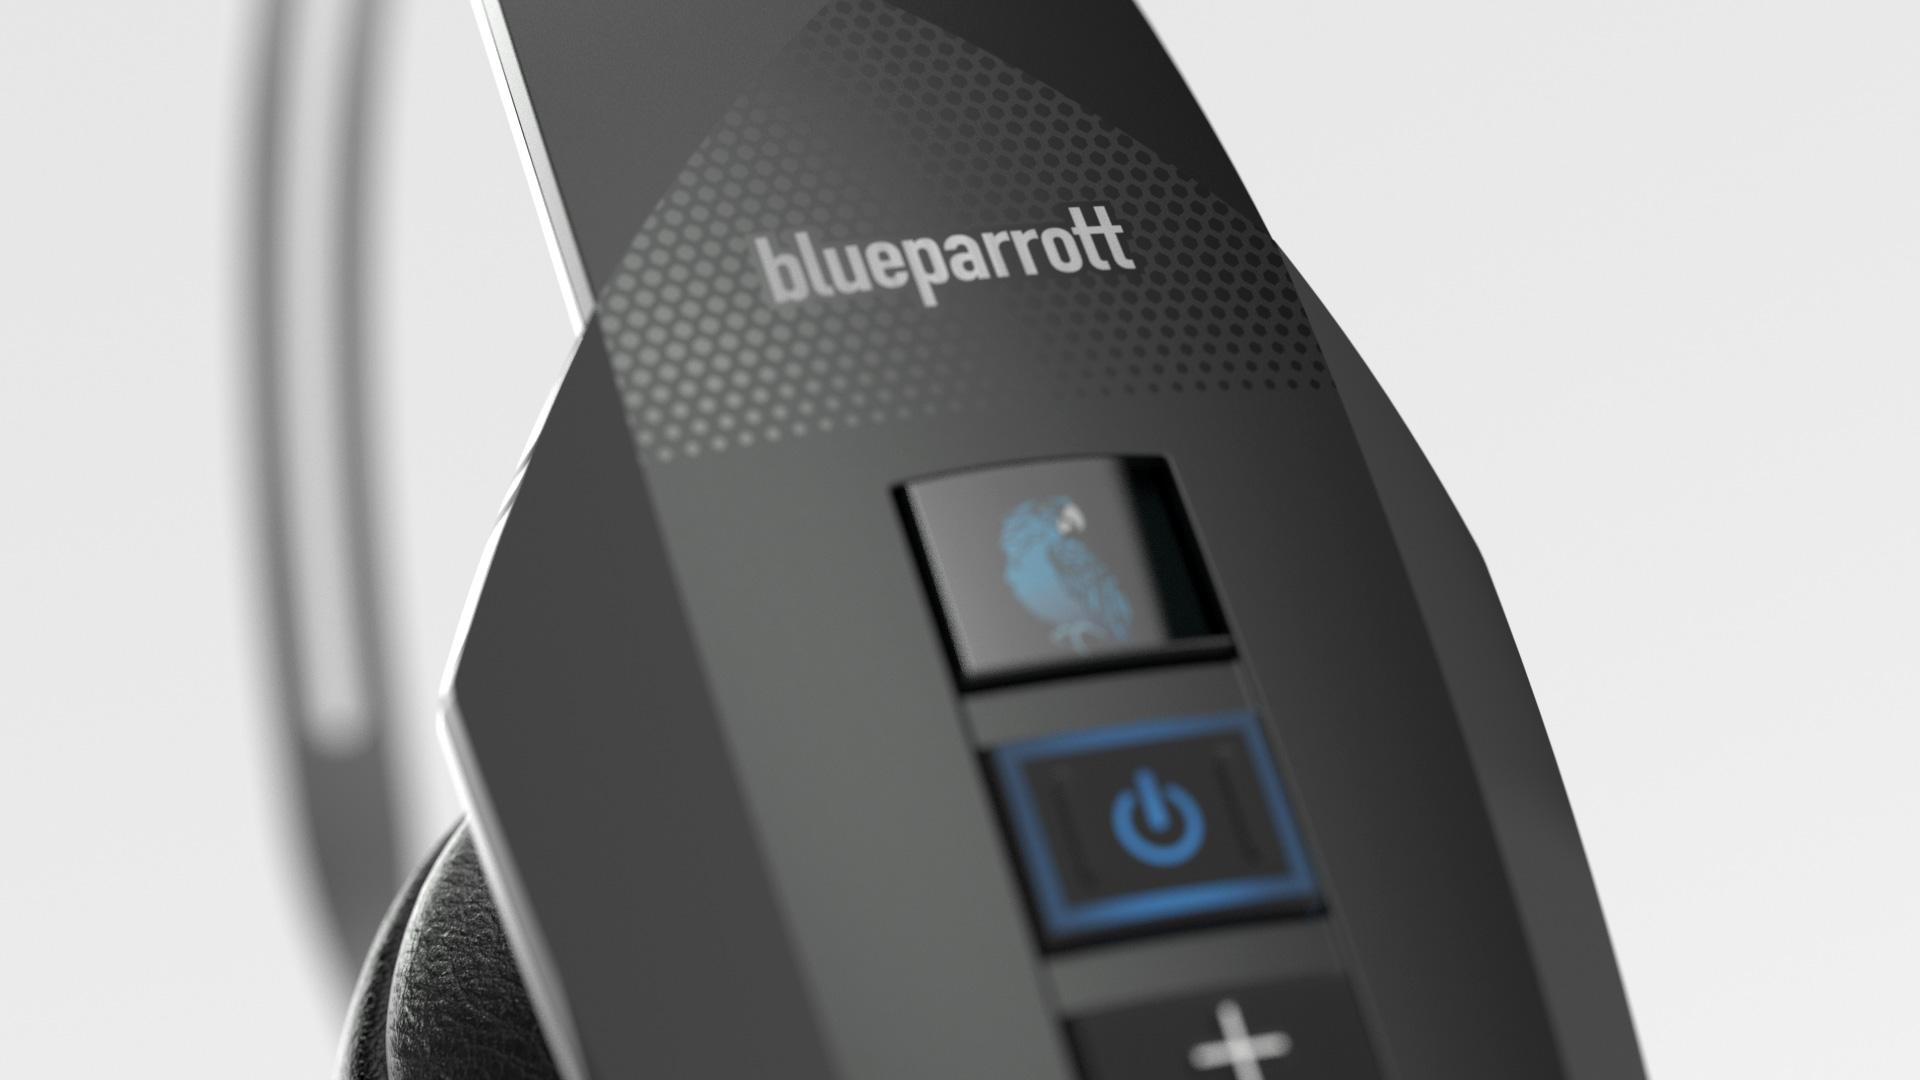 jabra-blue-parrot-renders-01